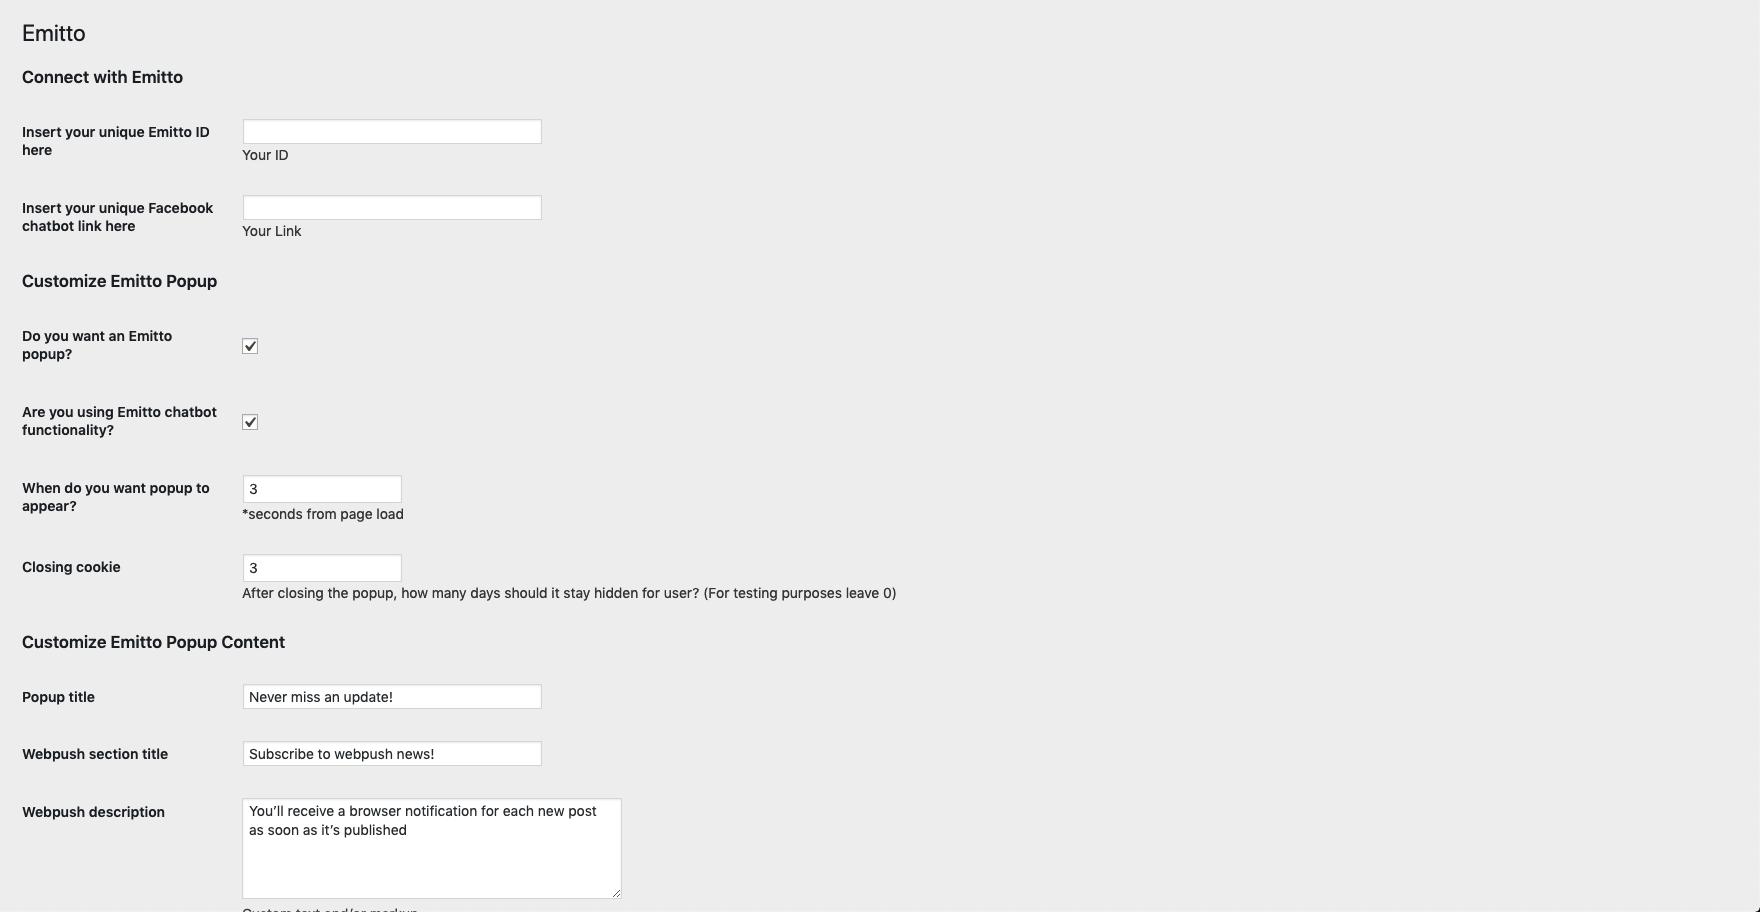 Emitto plugin popup customization